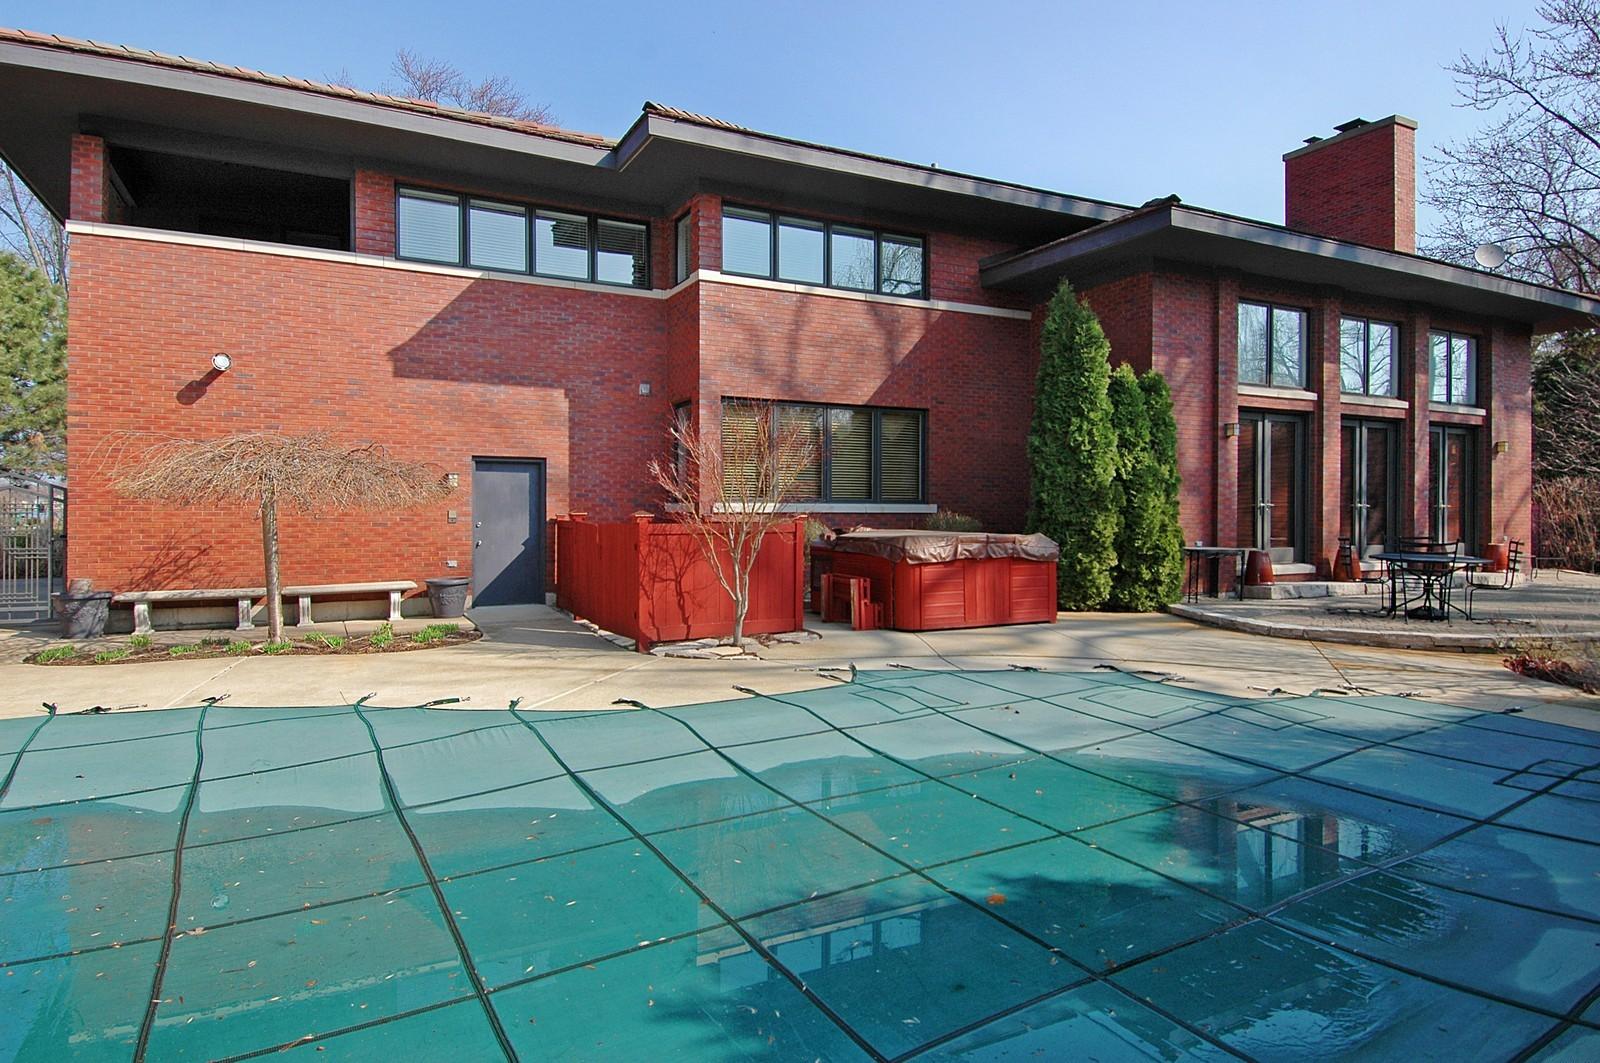 Real Estate Photography - 751 Lake, Crystal Lake, IL, 60014 - Rear View